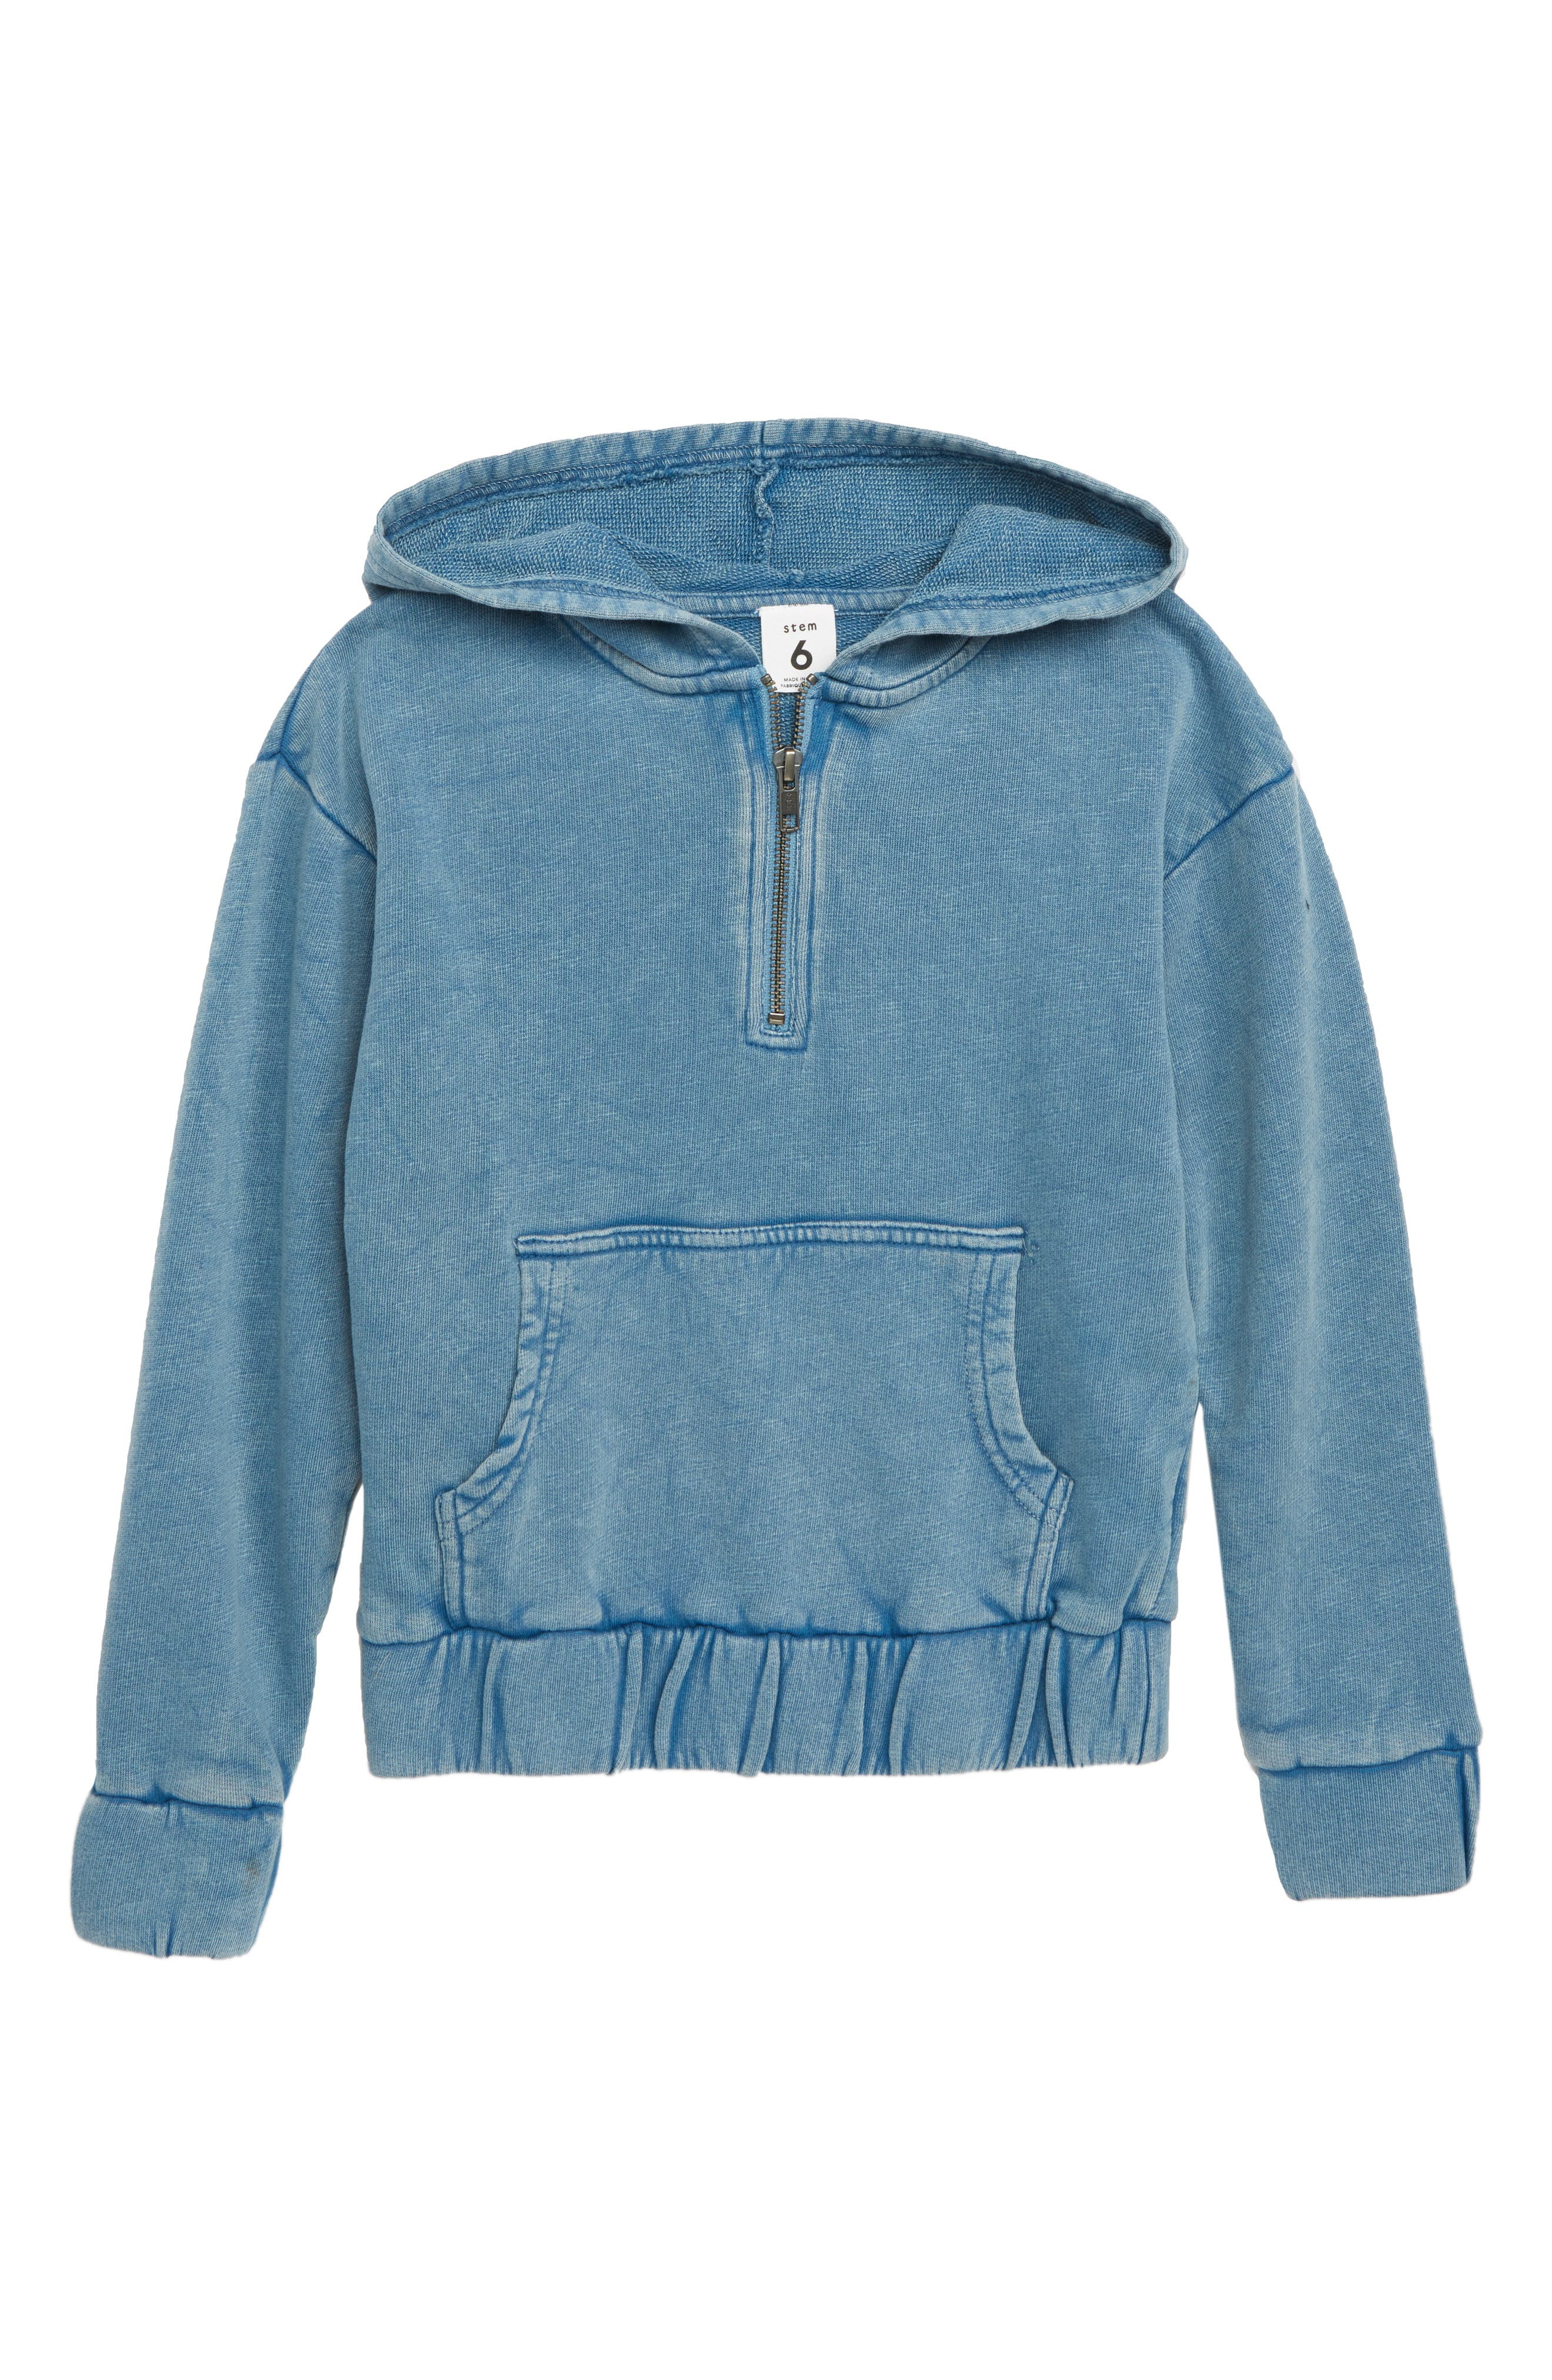 Quarter Zip Hoodie,                         Main,                         color, BLUE BOAT